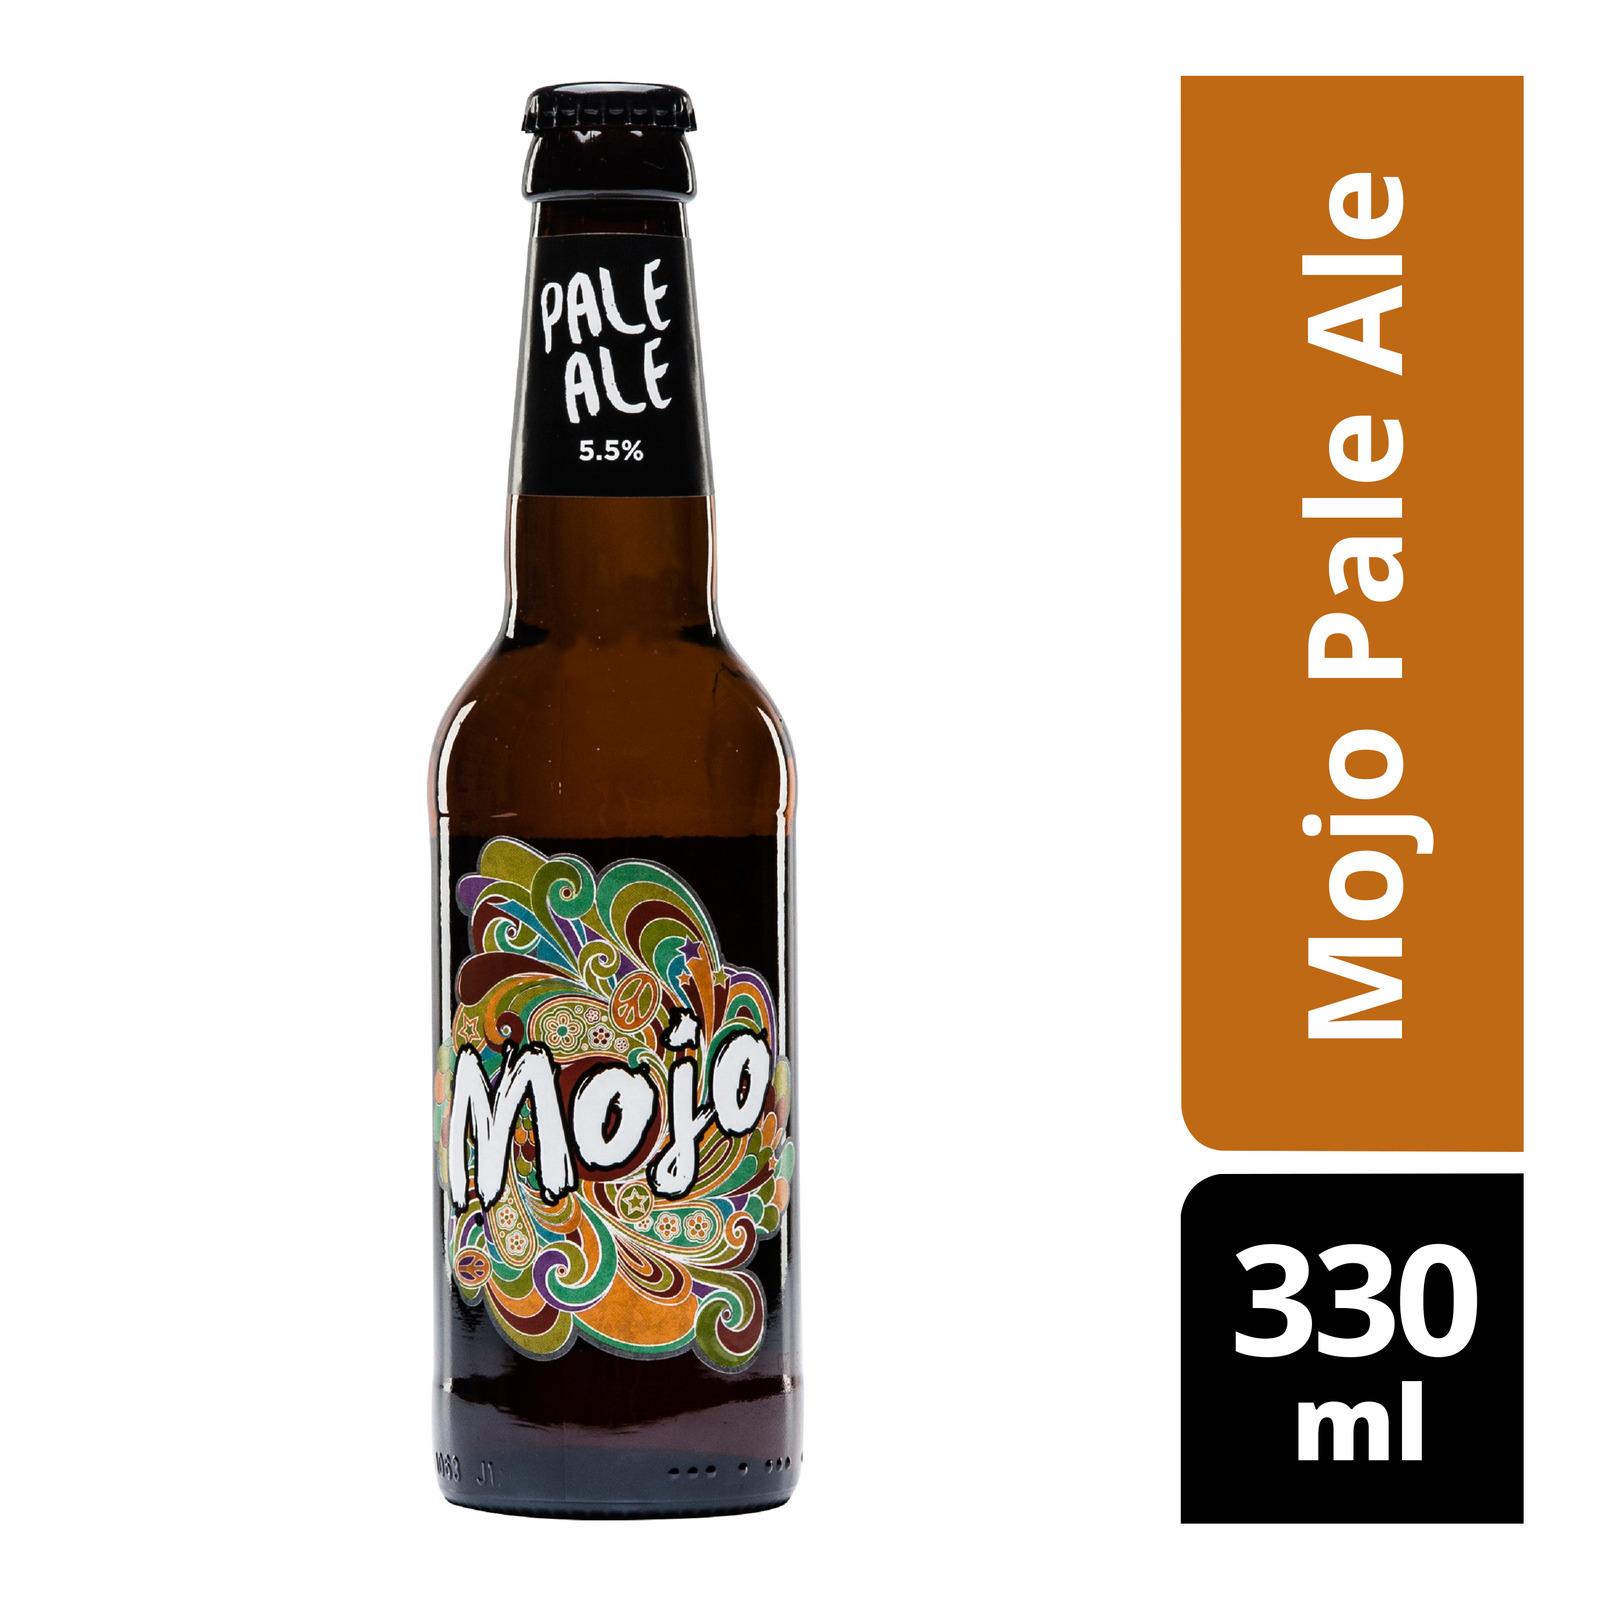 Robinsons Bottle Beer - Mojo Pale Ale